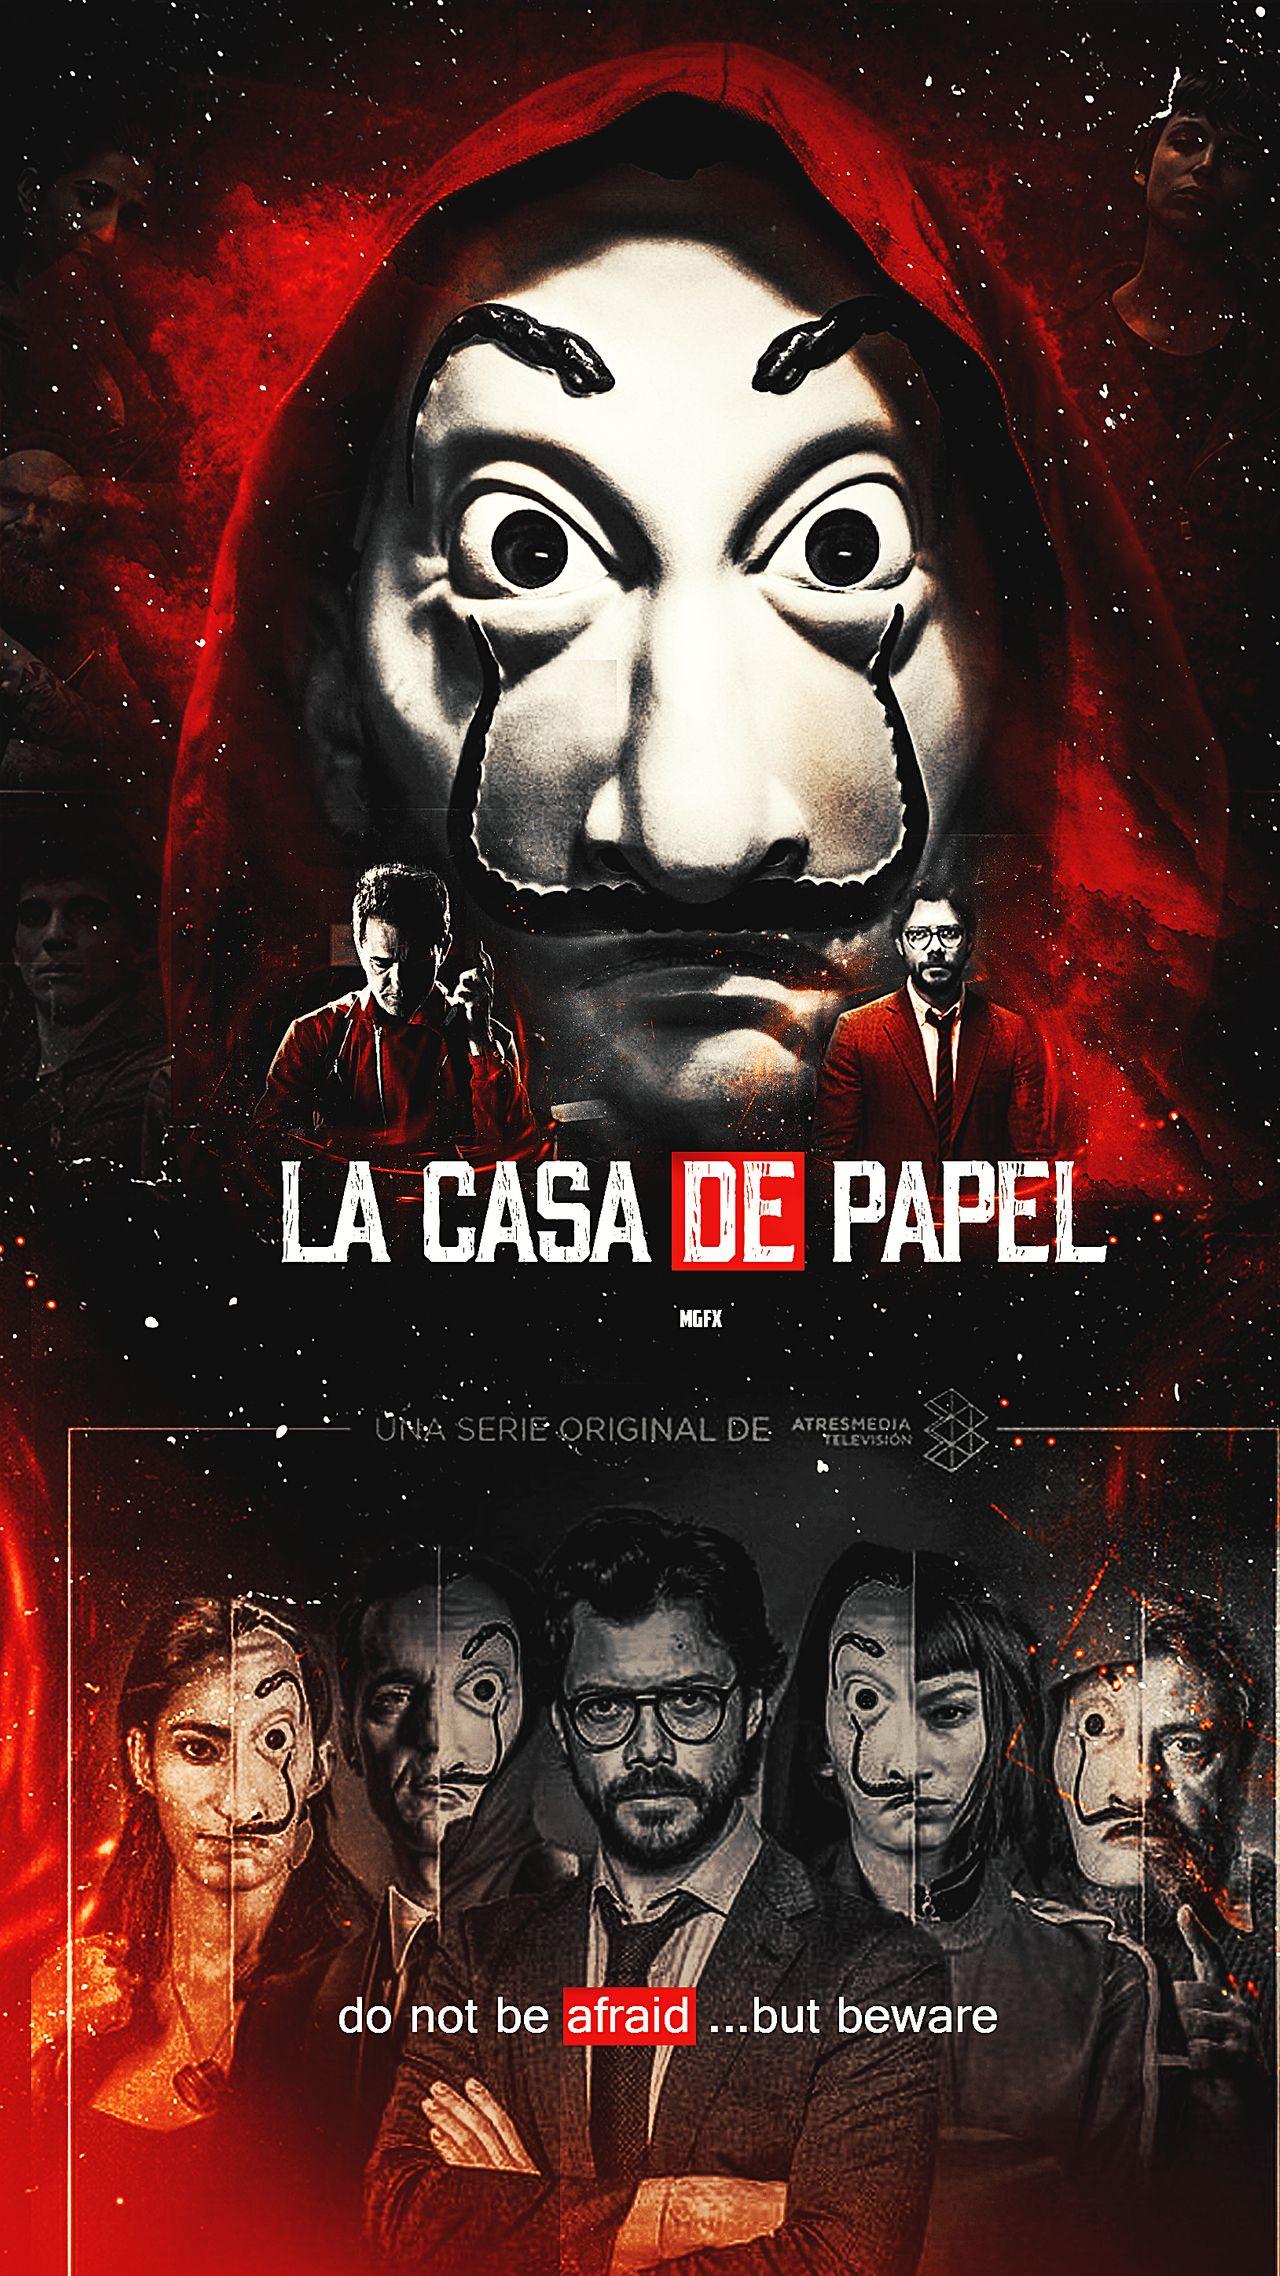 La Casa De Papel Wallpapers Posted By Michelle Anderson